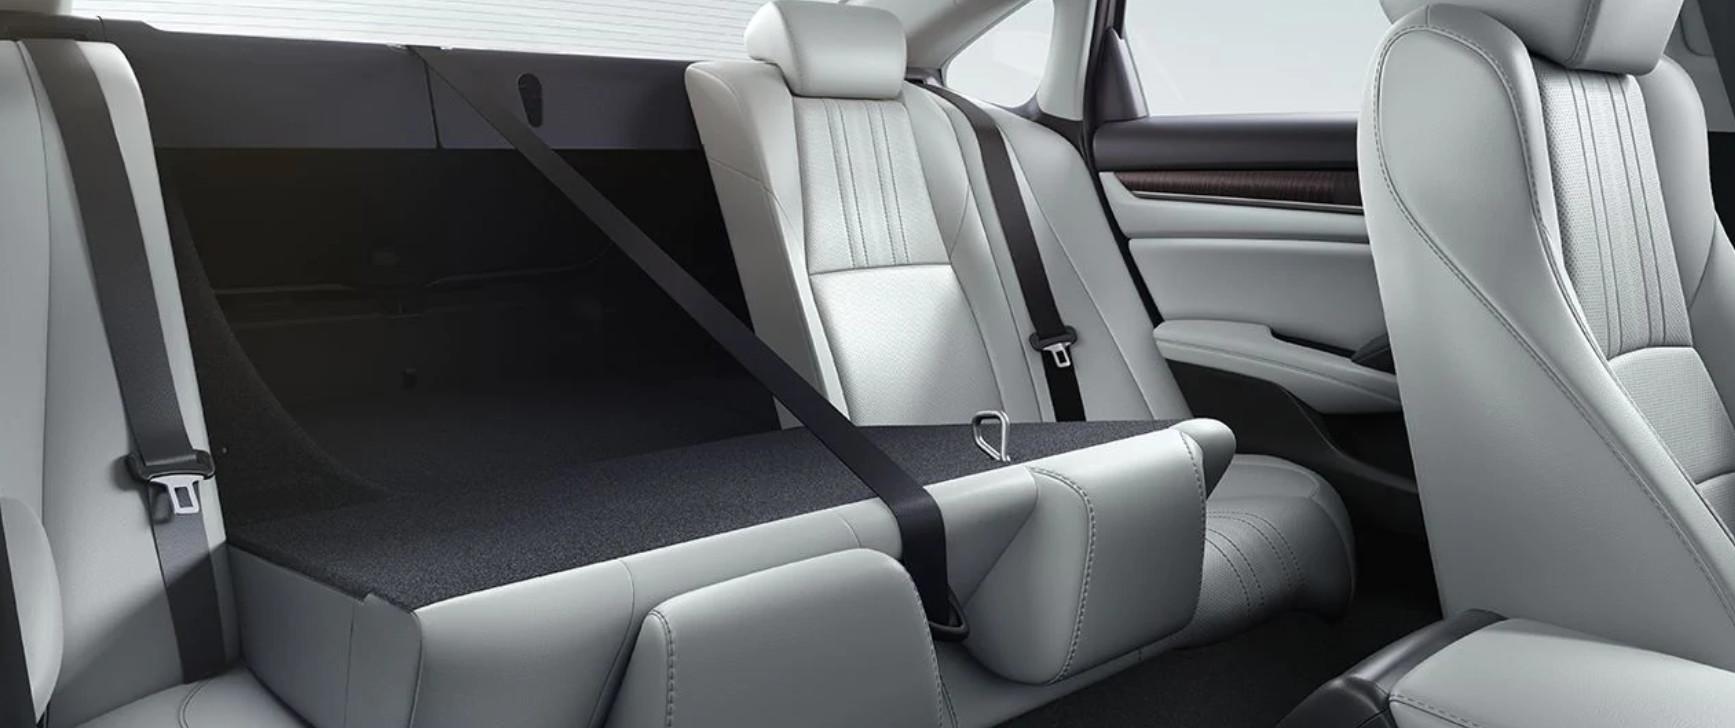 2020 Honda Accord Available 60/40 Split Rear Seatback